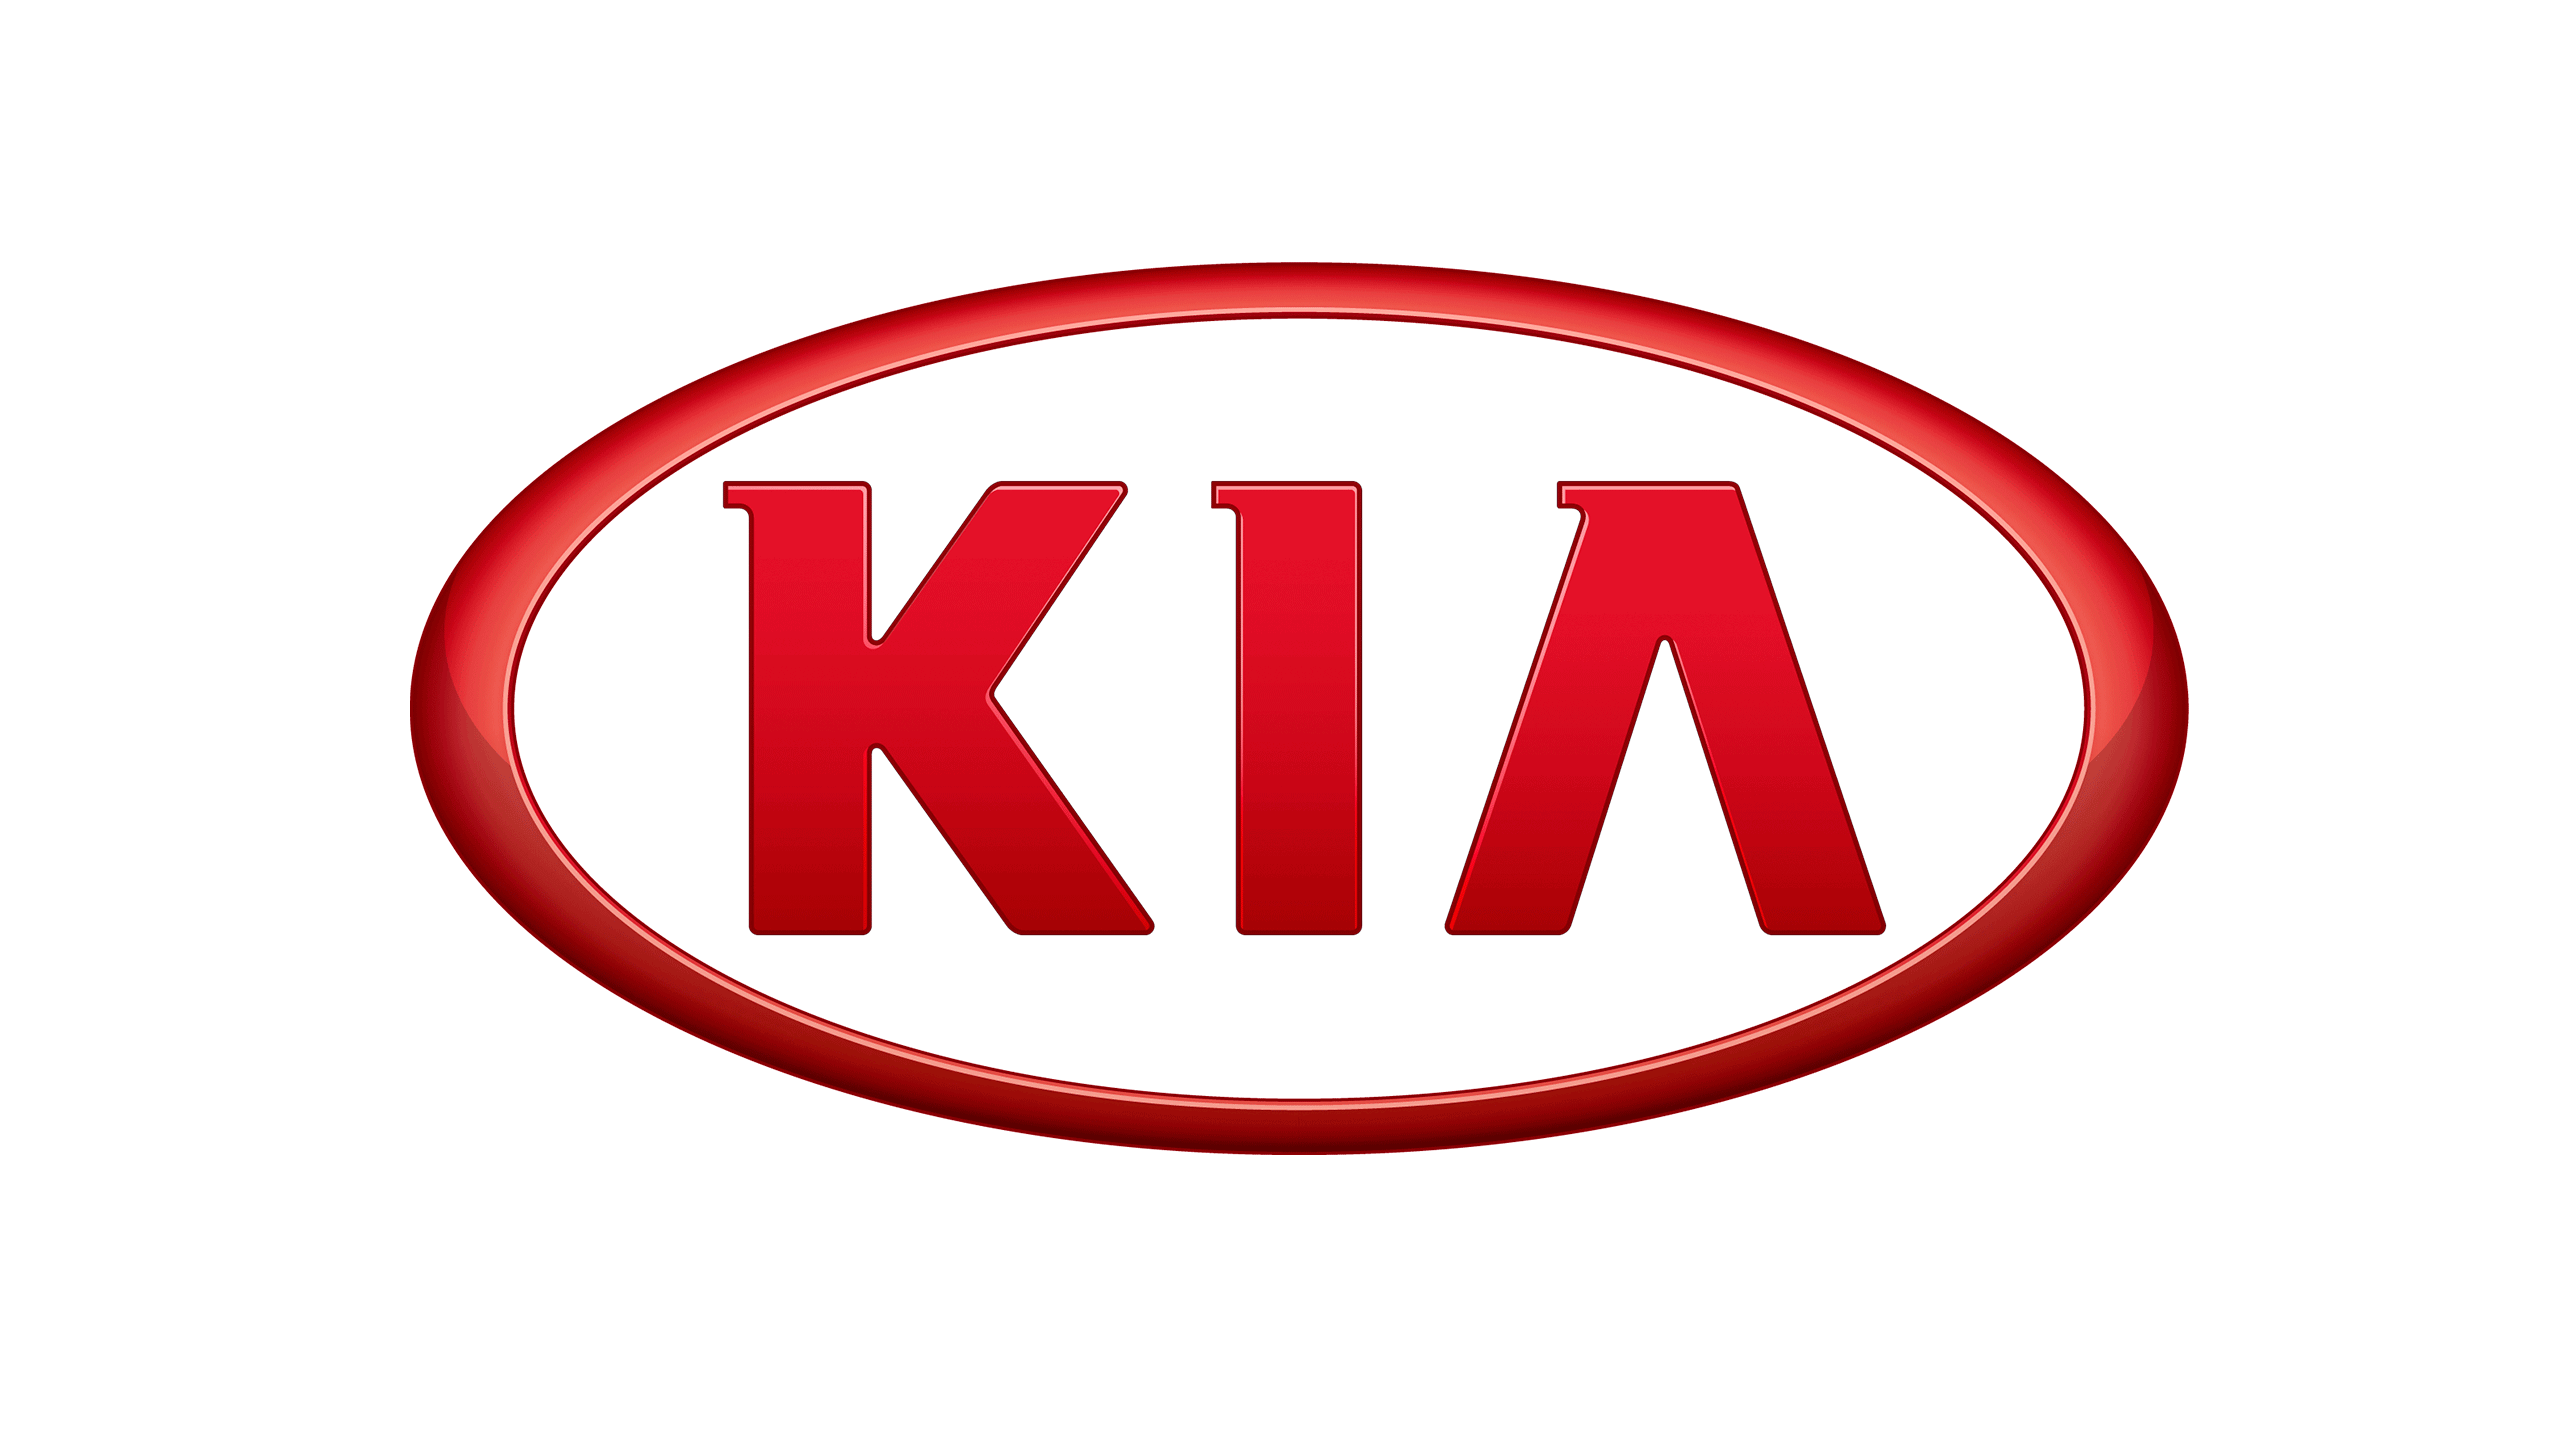 http://rpmautolease.com/wp-content/uploads/2017/08/Kia-logo-2560x1440.png